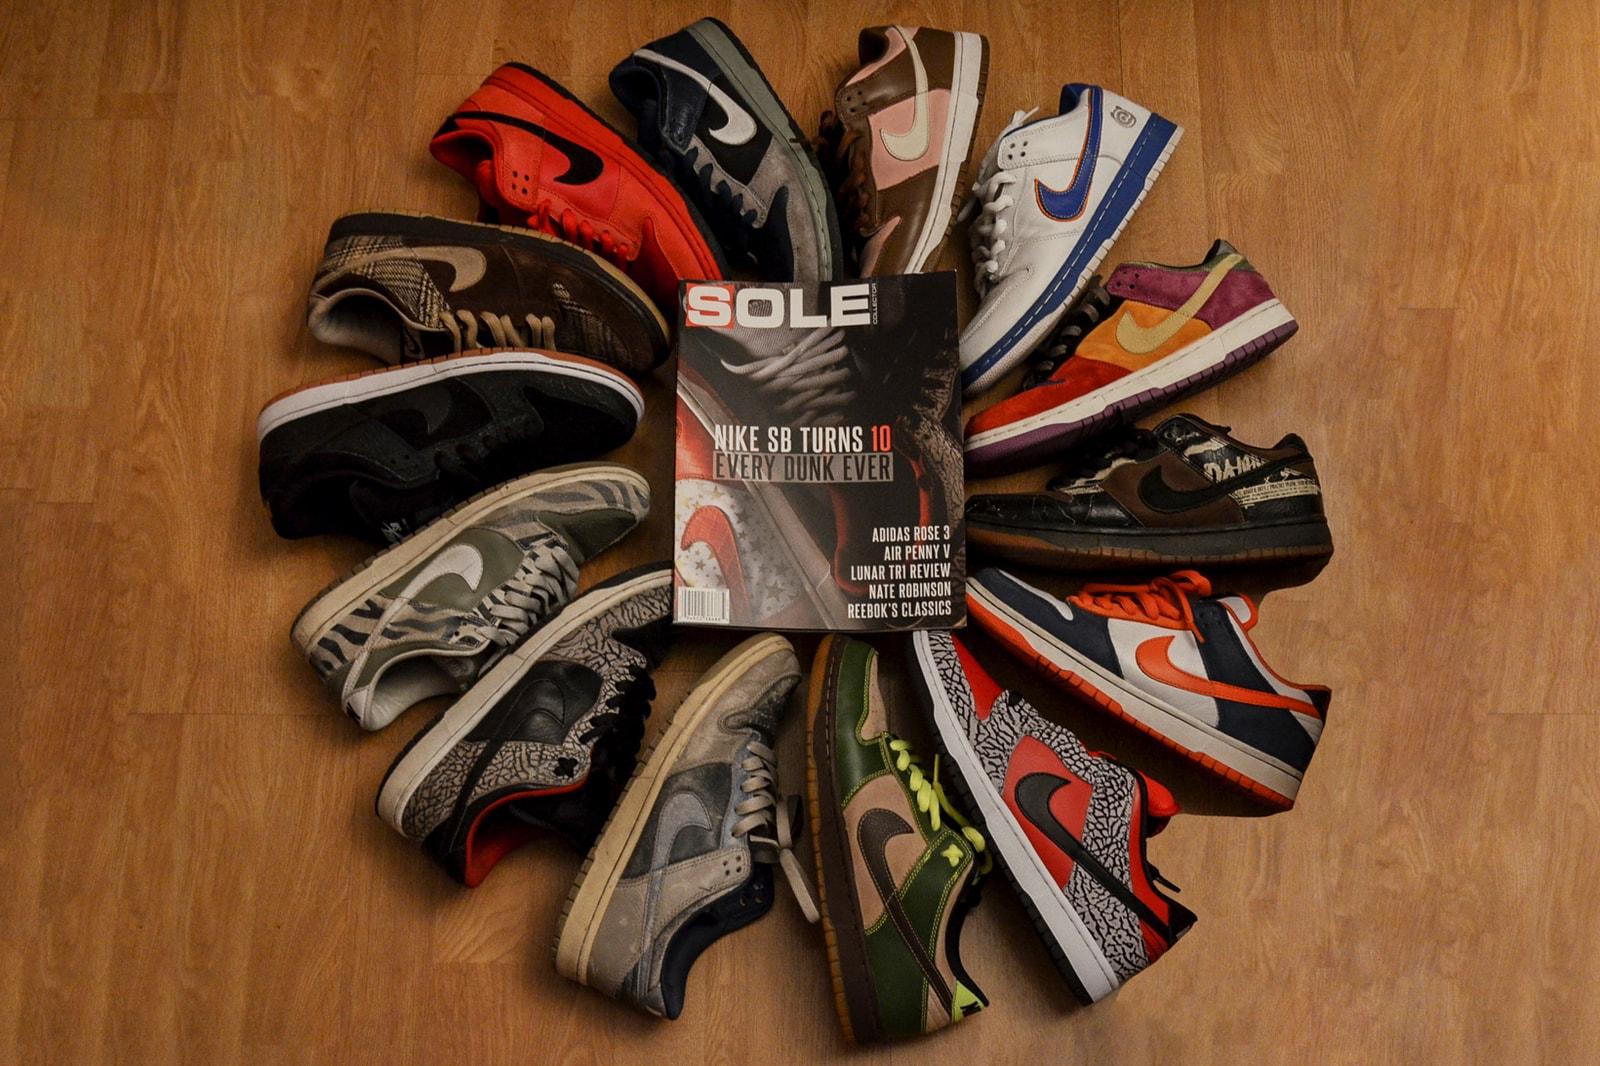 Nike SB Skateboarding Sneakers Forums Trends August Benzien Kevin Imamura Supreme Medicom Tiffany Stussy Jedi Zoo York Danny Supa